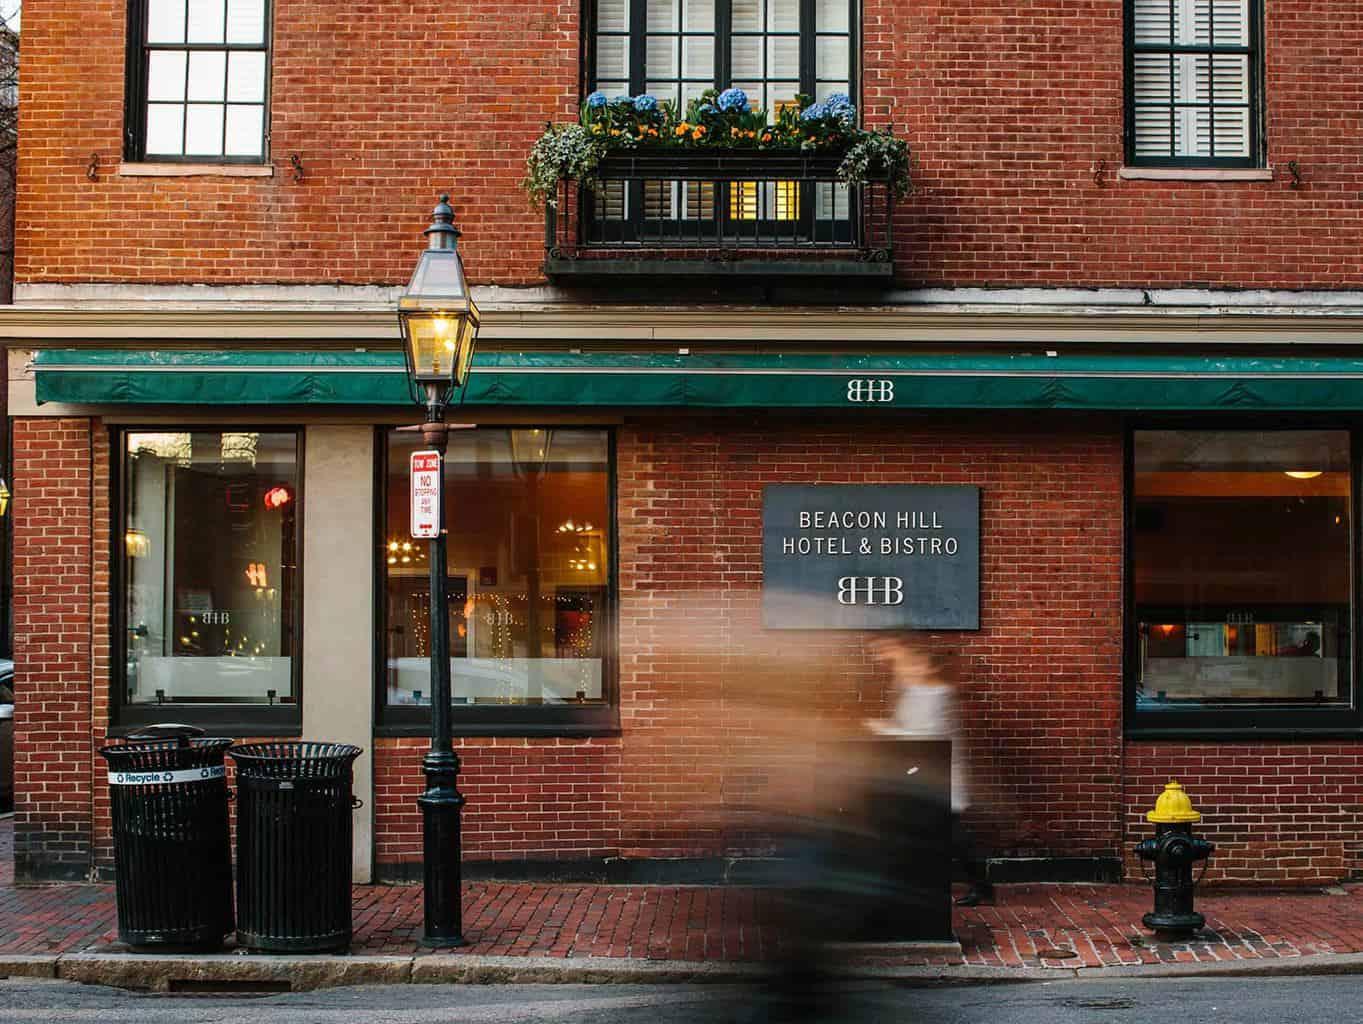 Td garden in boston – Tag – Travel Breaking News